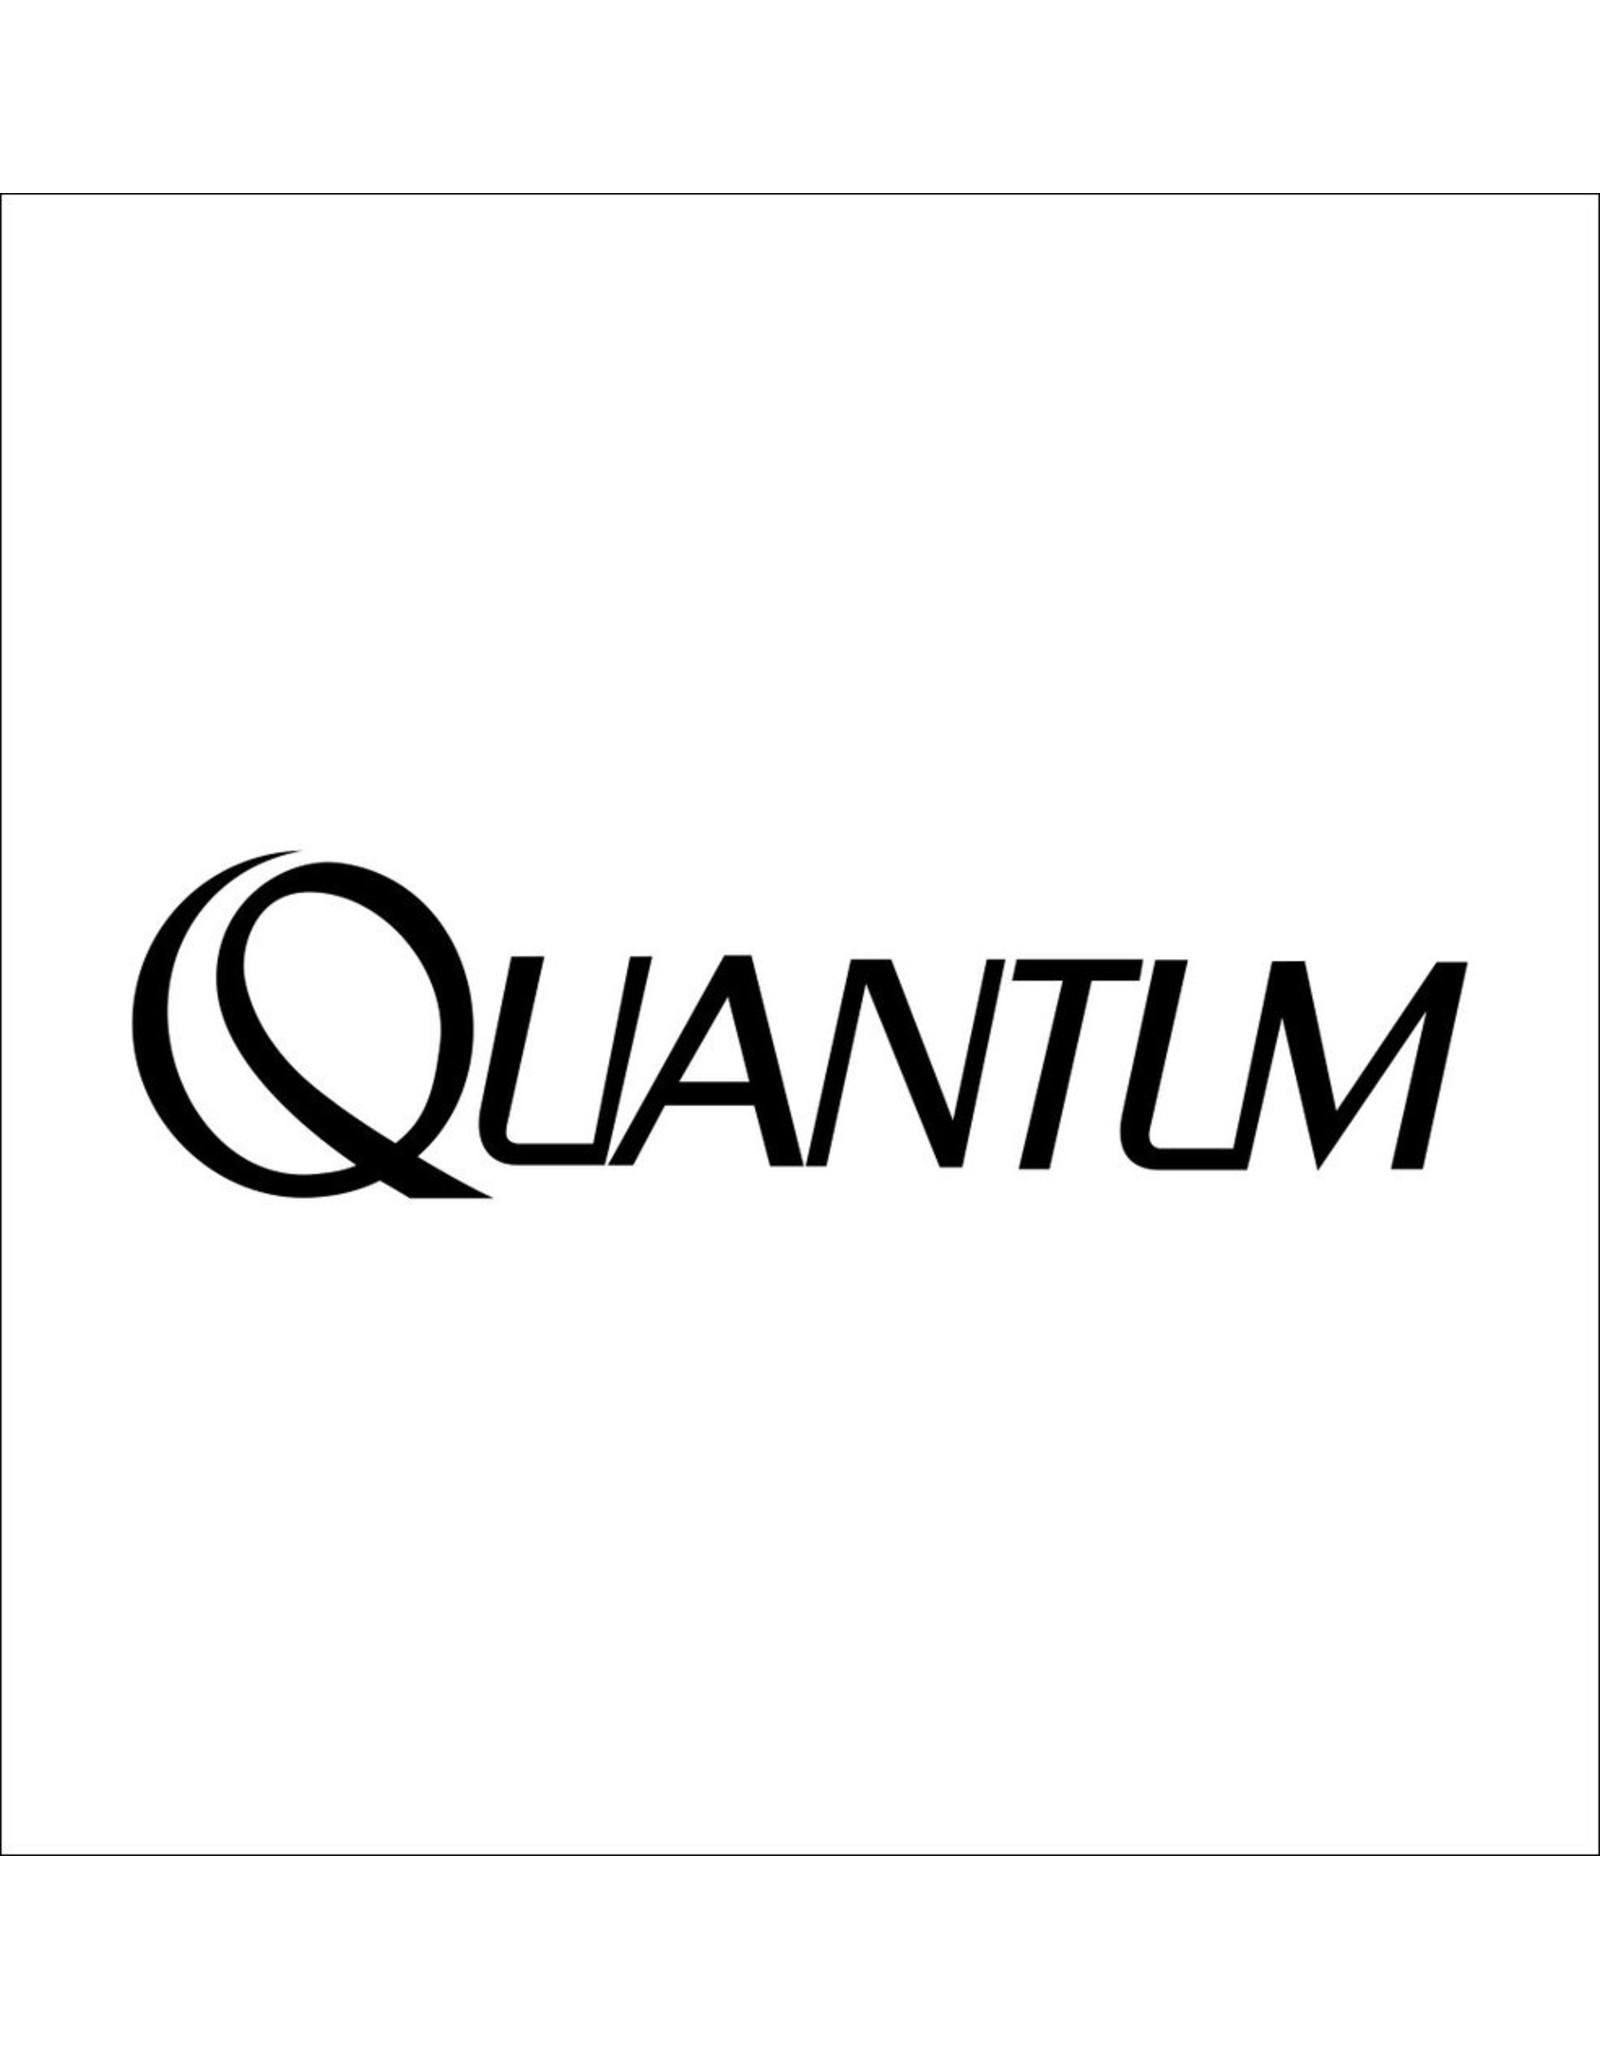 Quantum BODY REAR COVER SCREW